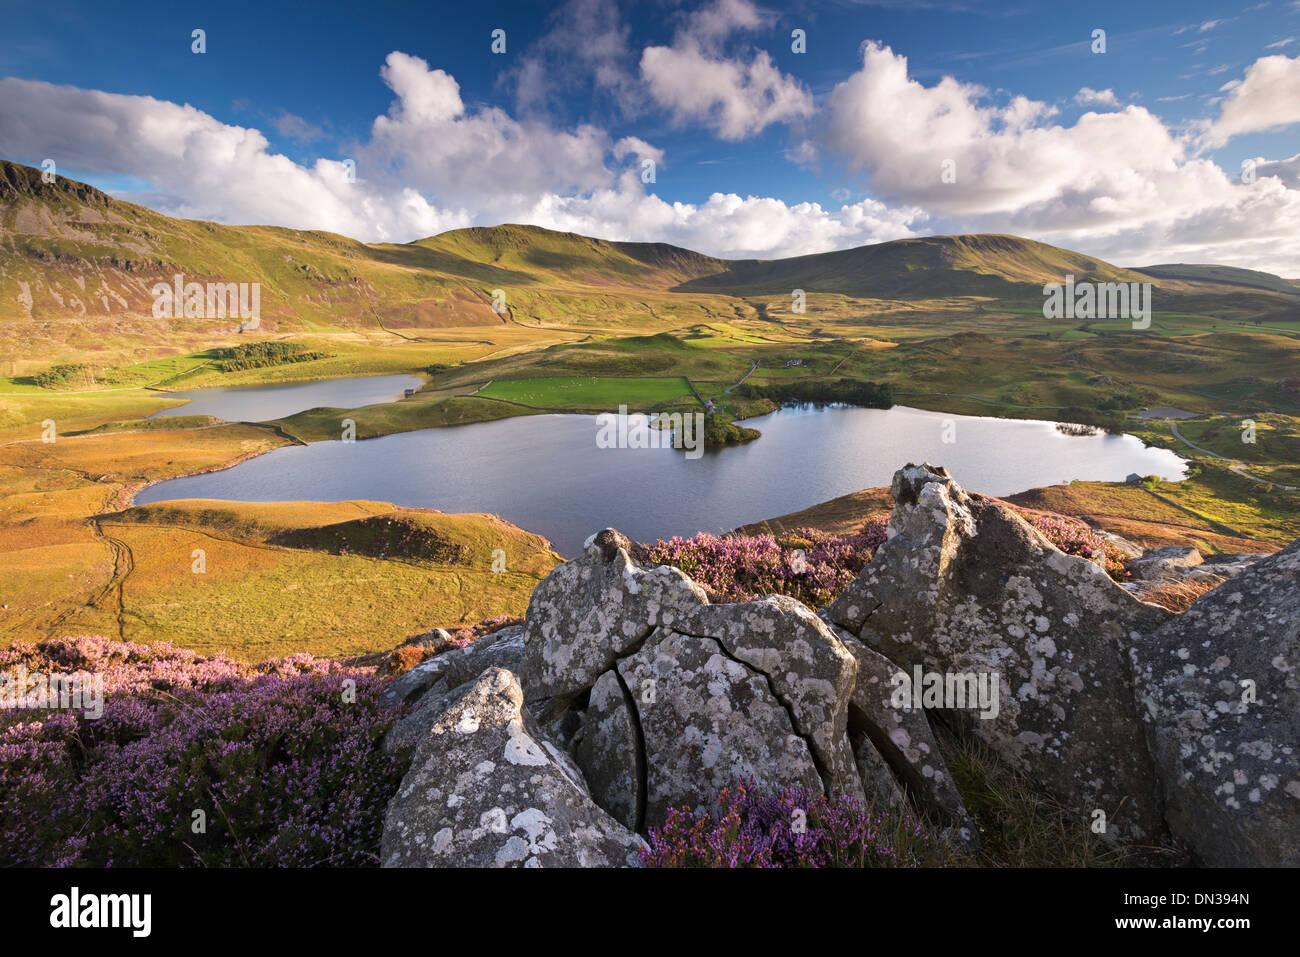 Sunlit mountains surrounding Cregennen Lakes, Snowdonia National Park, Wales, UK. Late Summer (September) 2013. Stock Photo